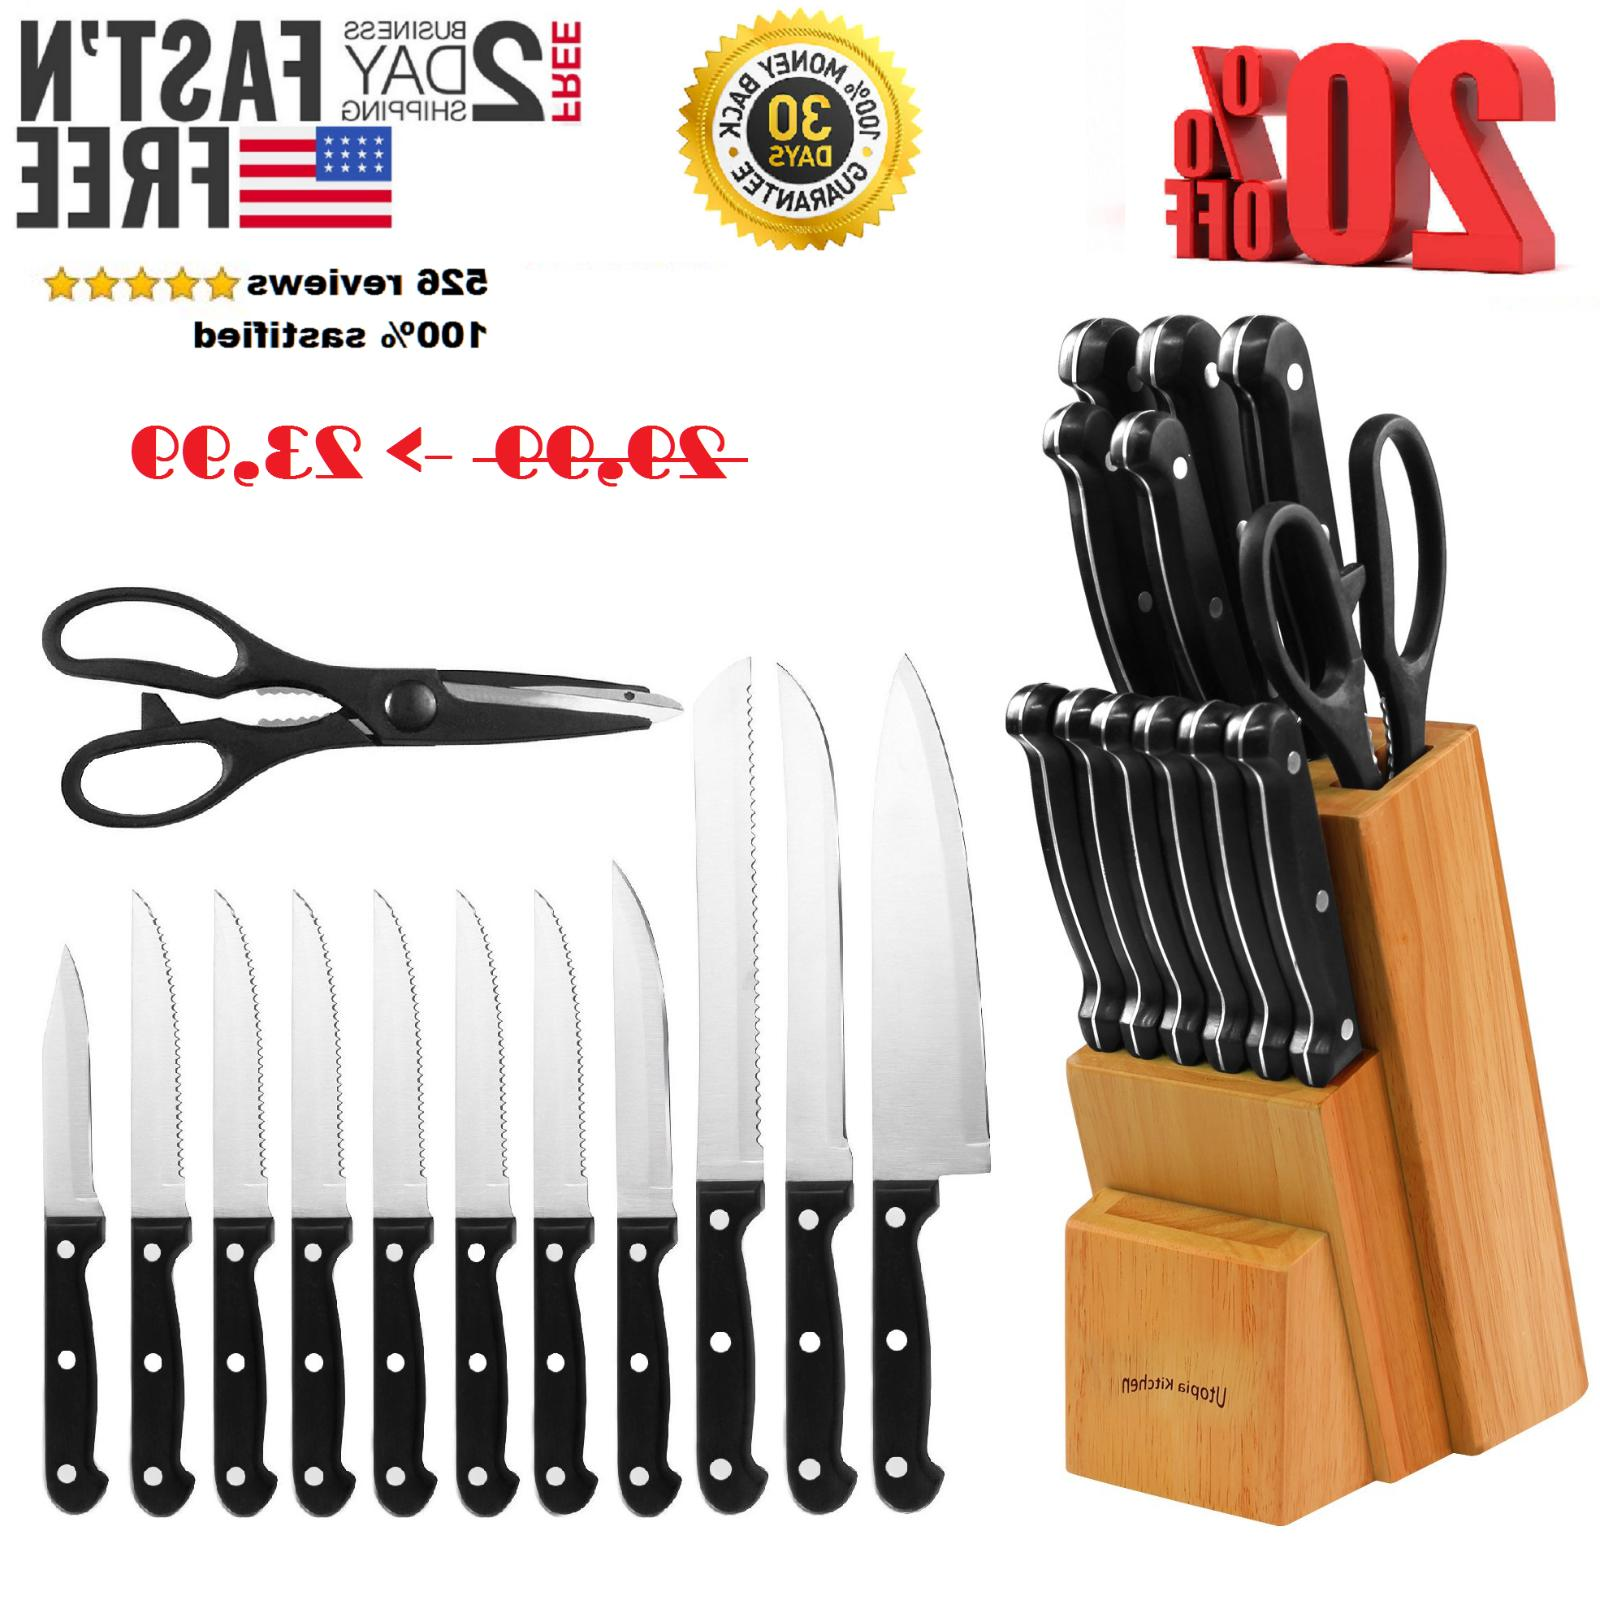 Knife Utopia Block Set Kitchen Sharpening Stainless Steel St